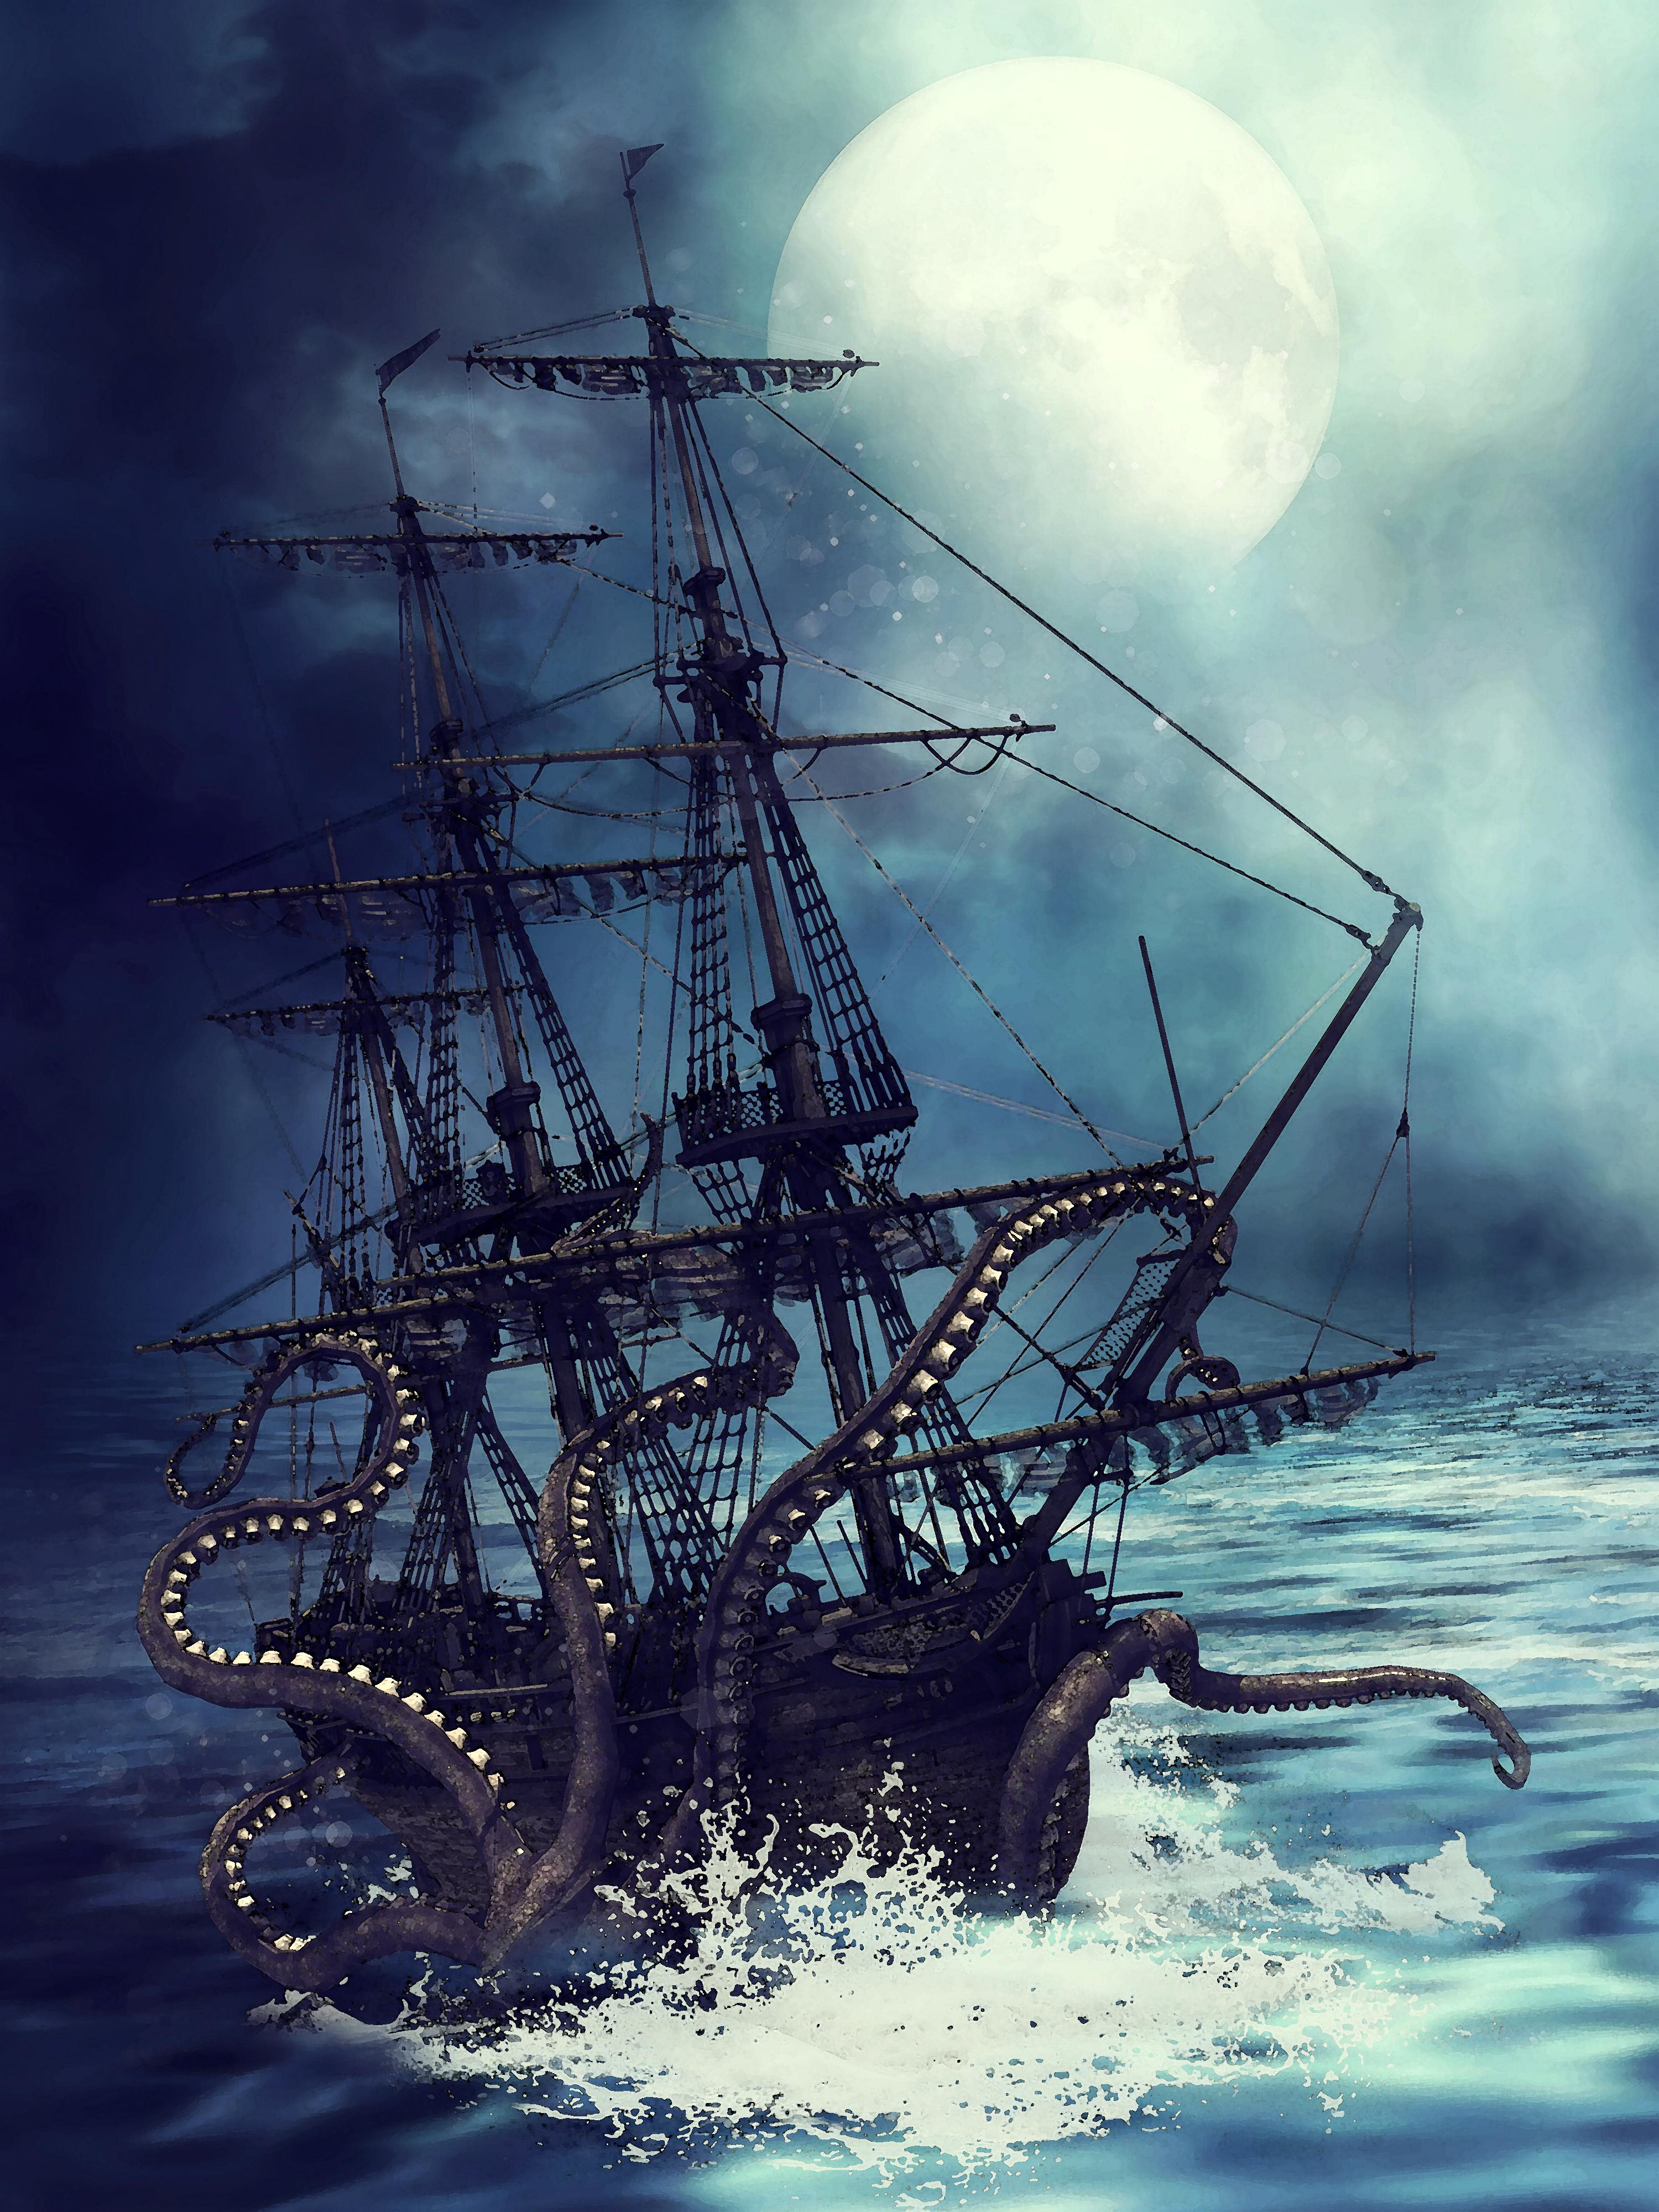 The Perils of the Sea